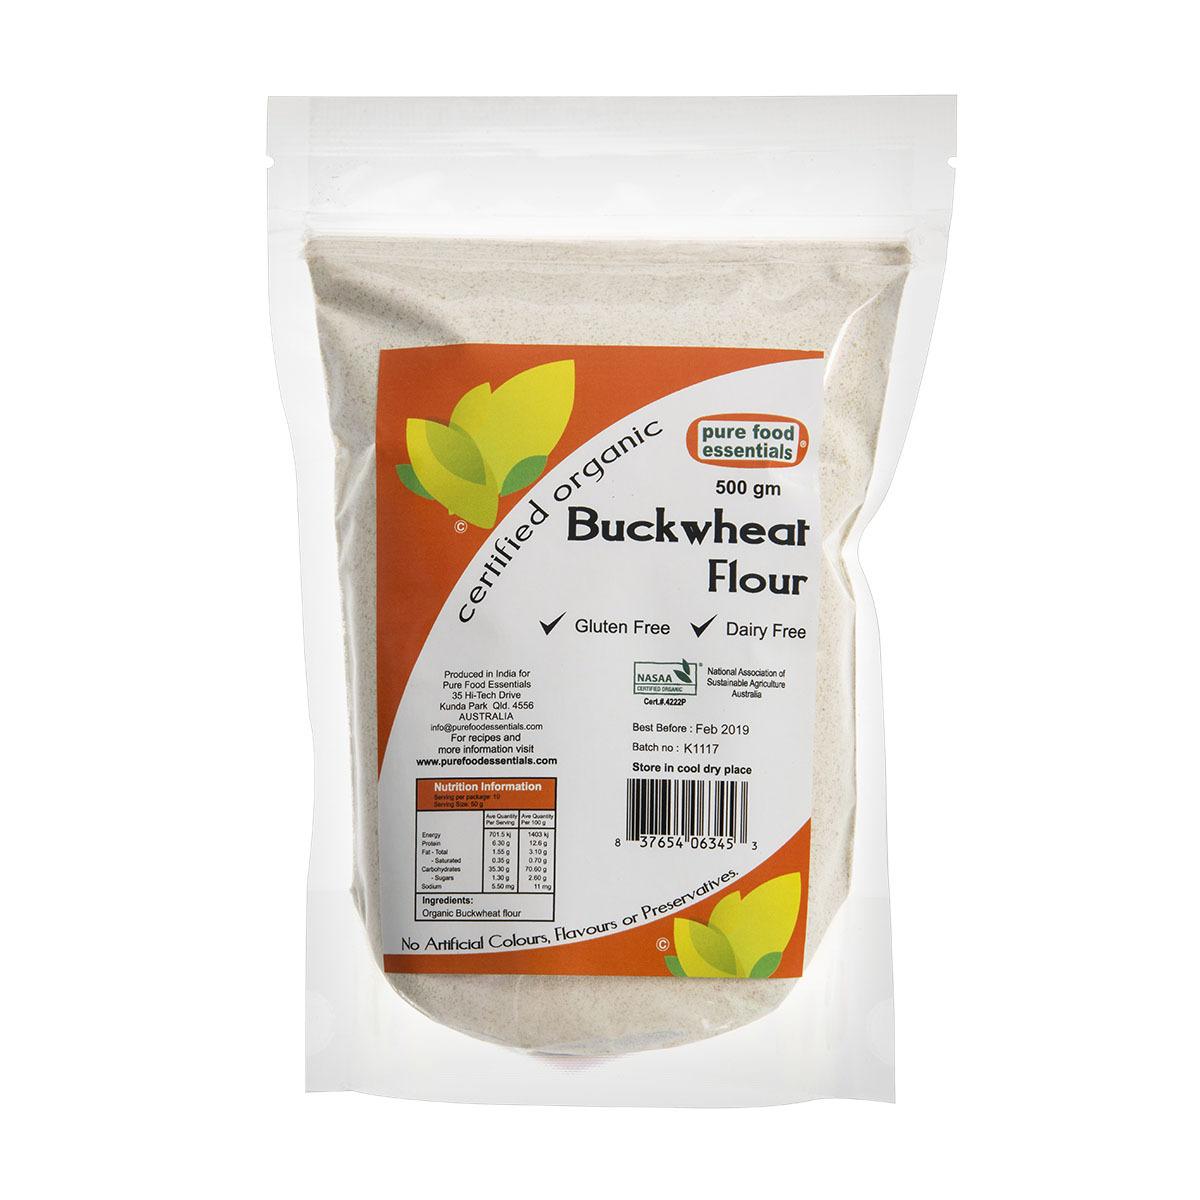 pure food essentials buckwheat flour